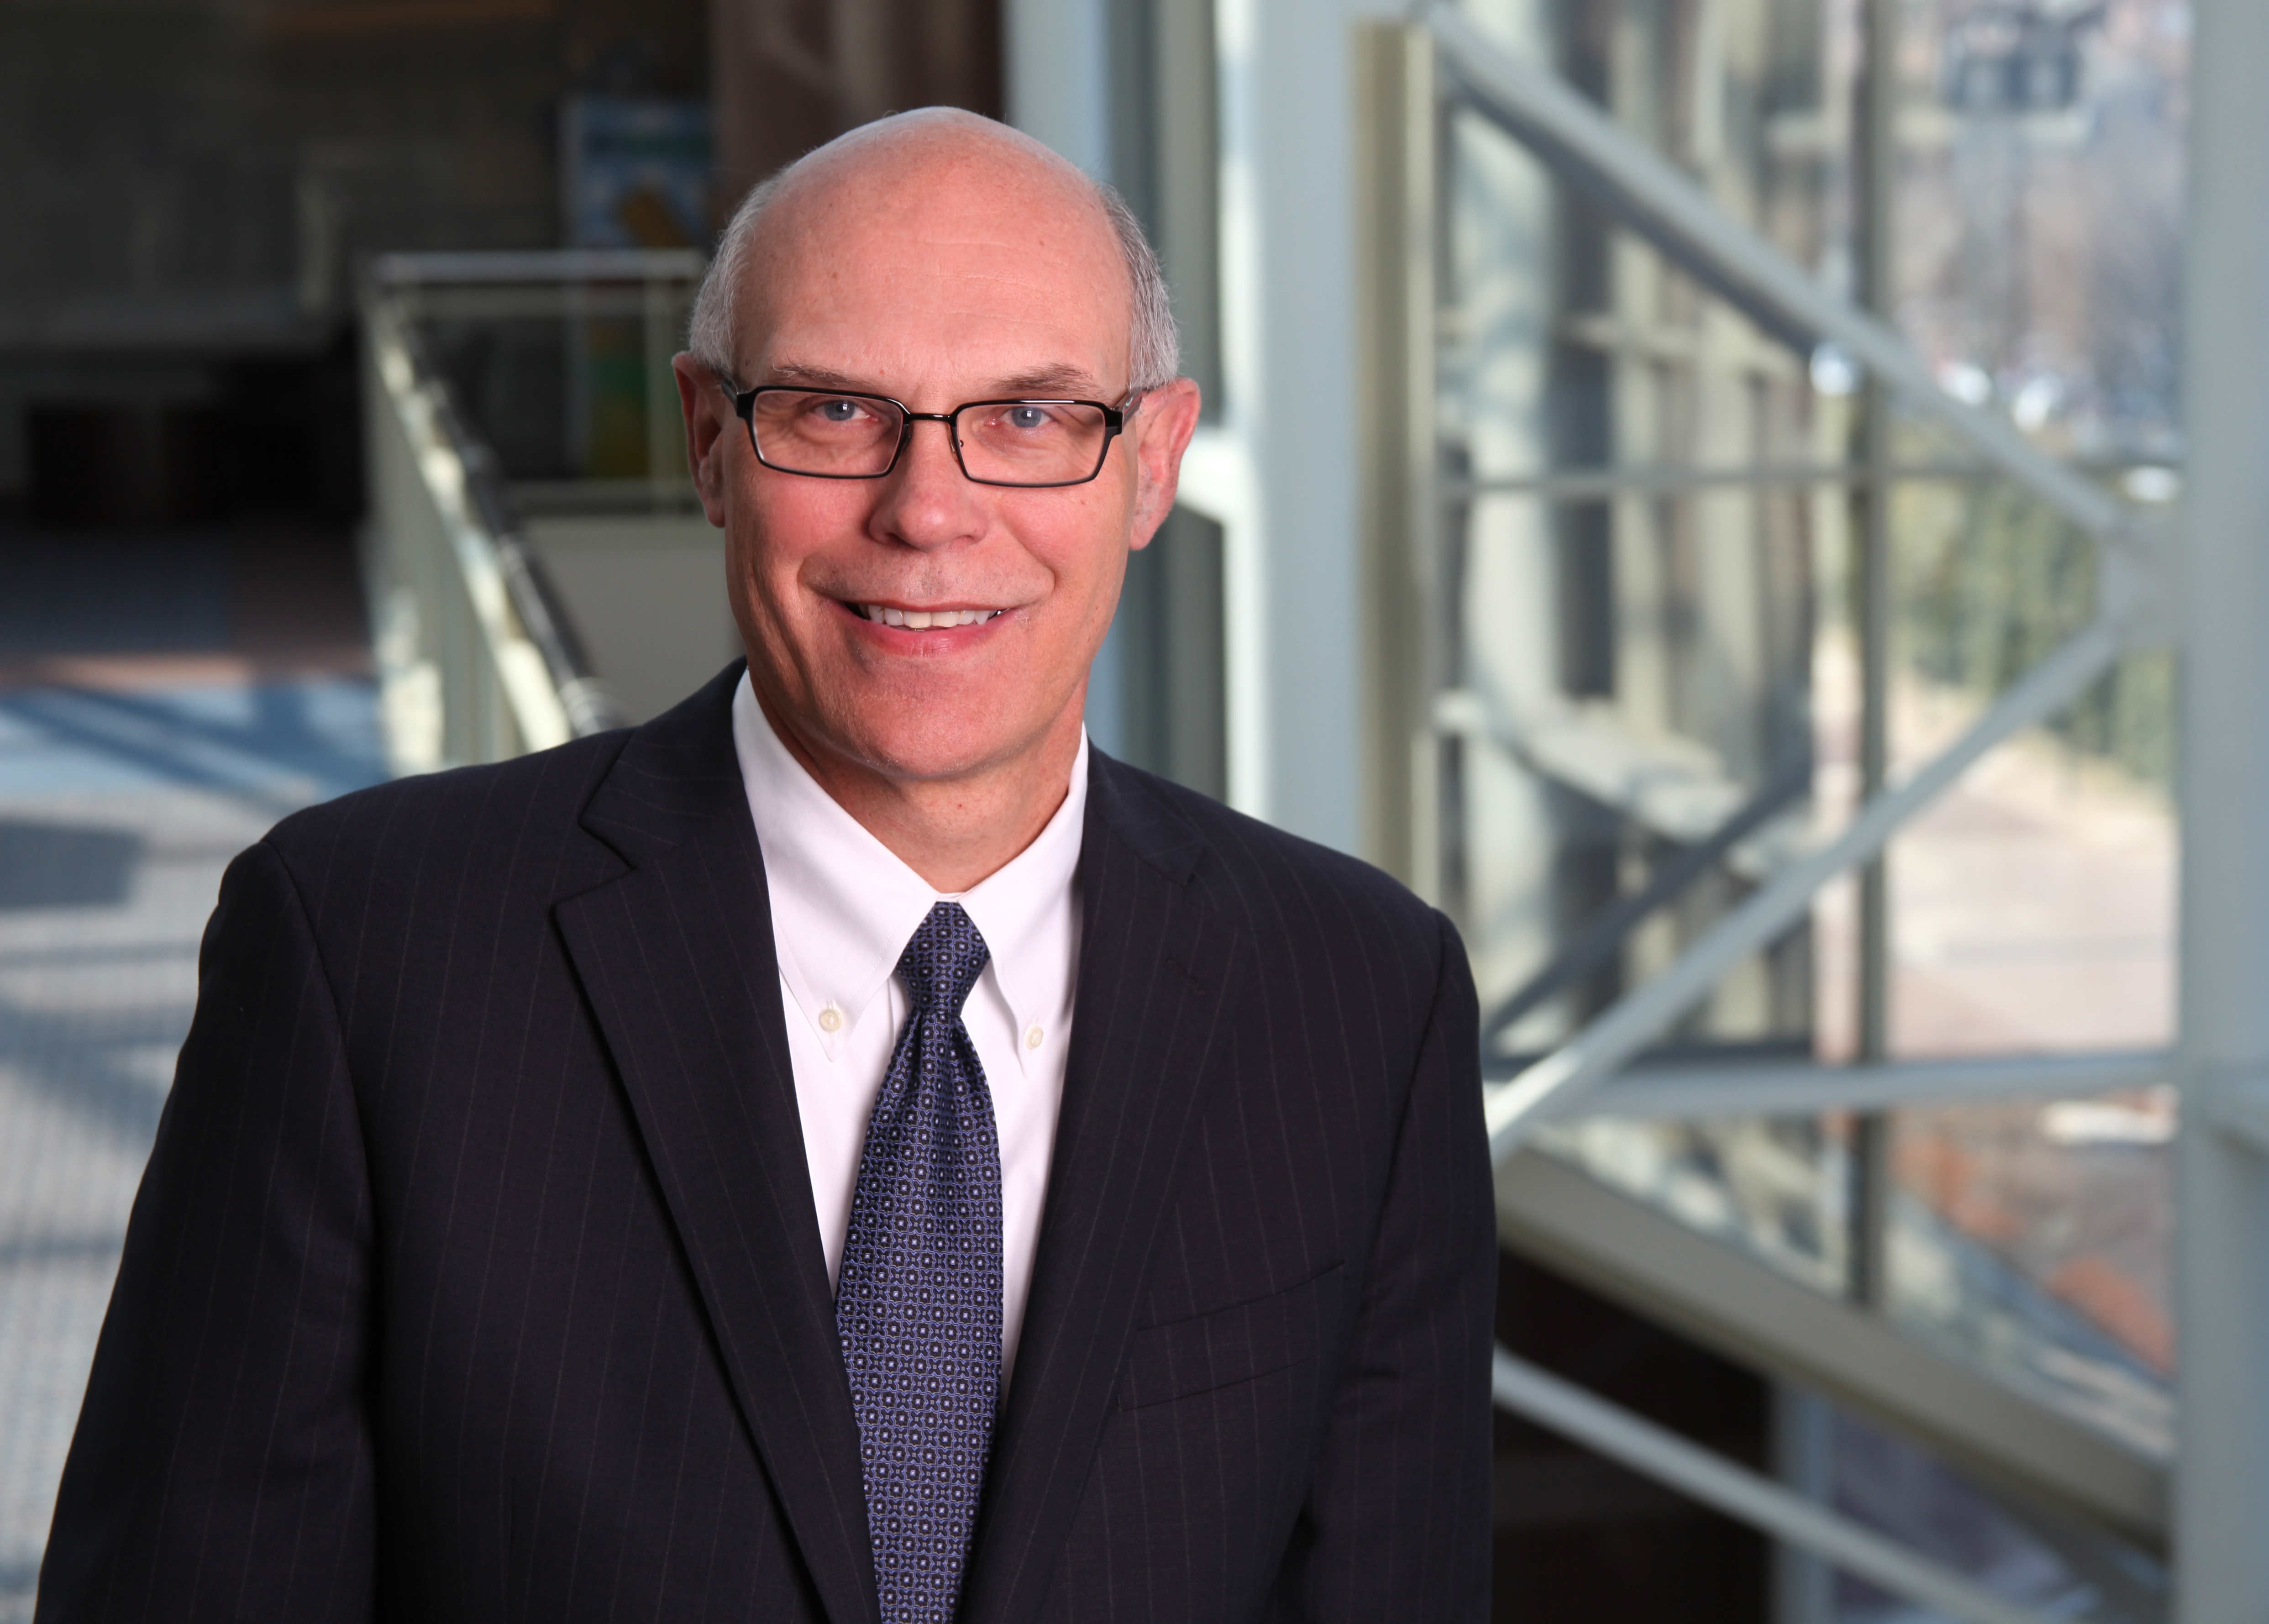 Warner Baxter - Chairman, President, & CEO, Ameren Corporation